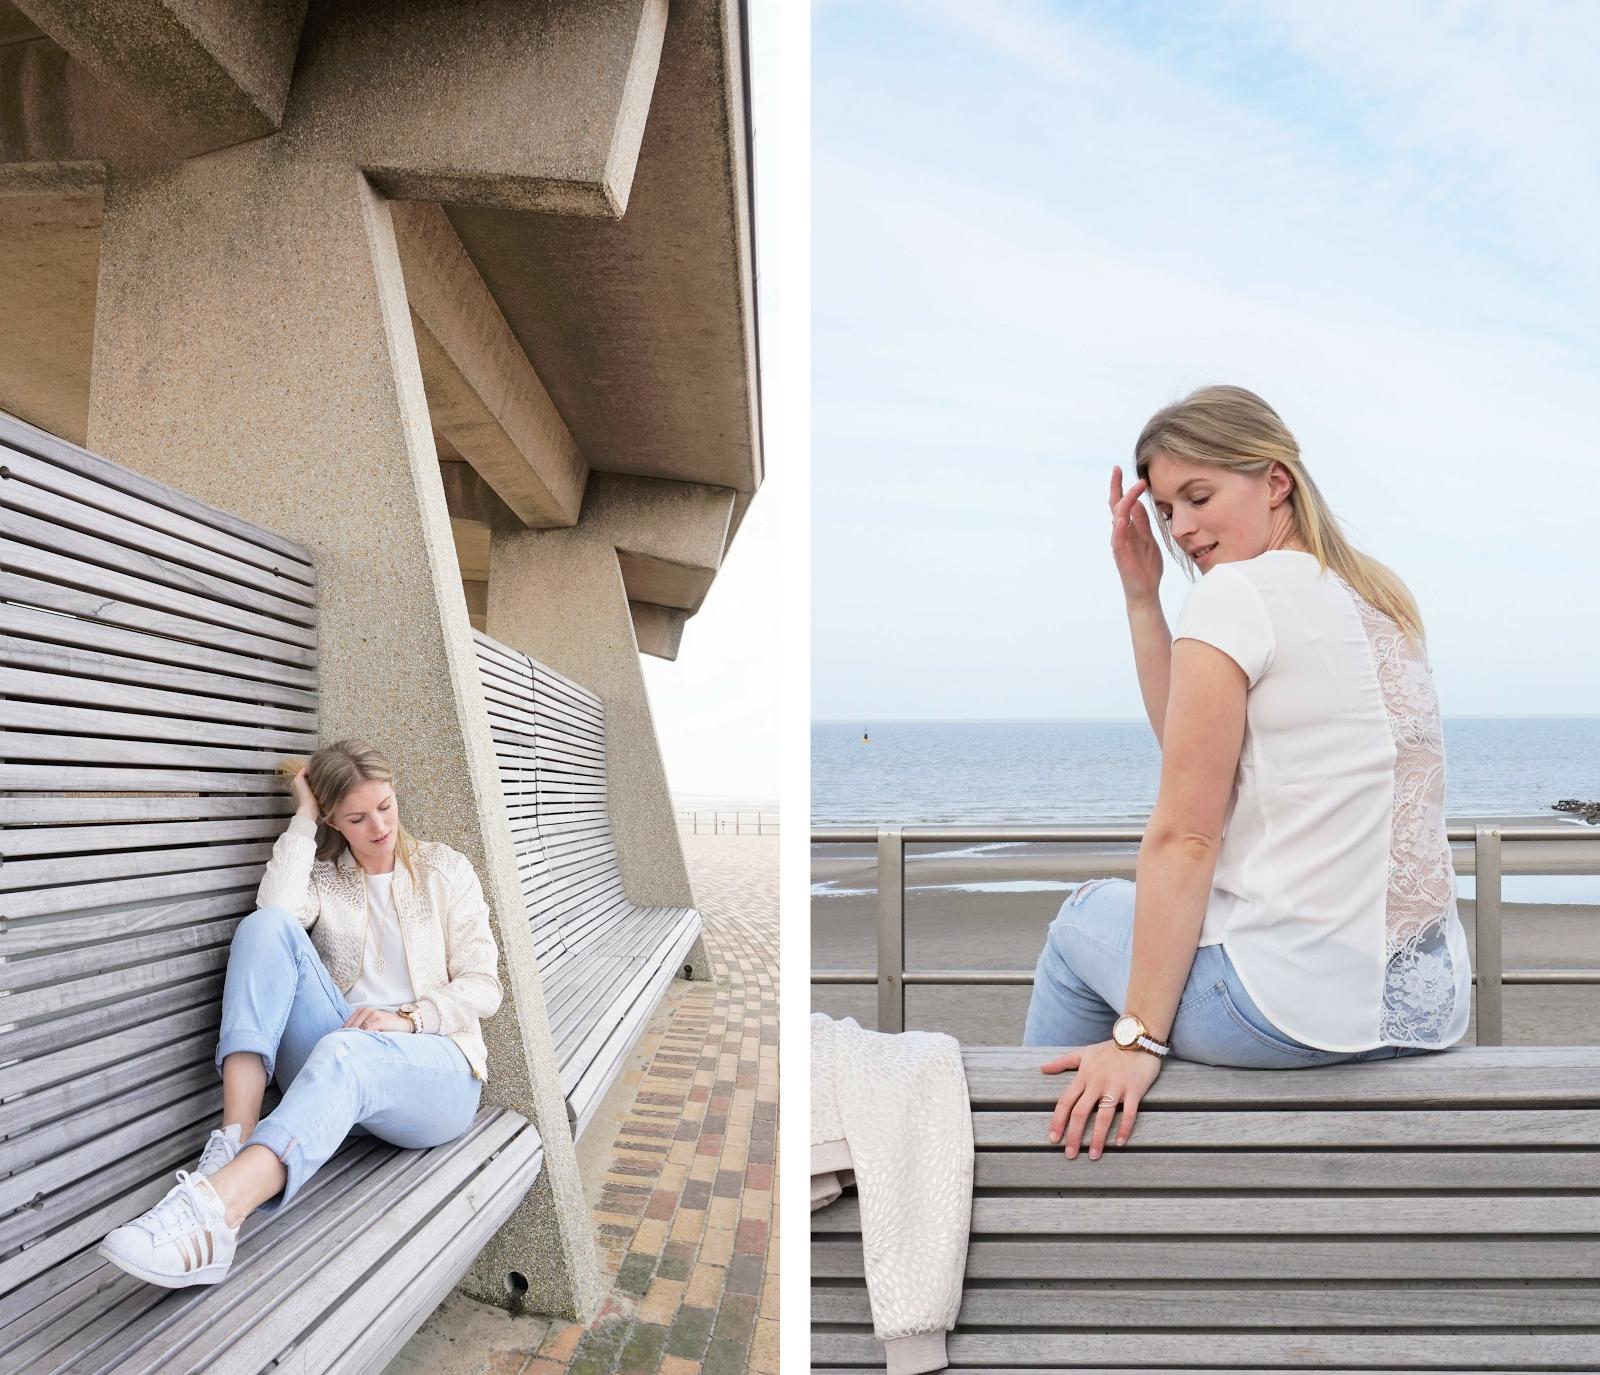 Untitled%2Bdesign | Eline Van Dingenen